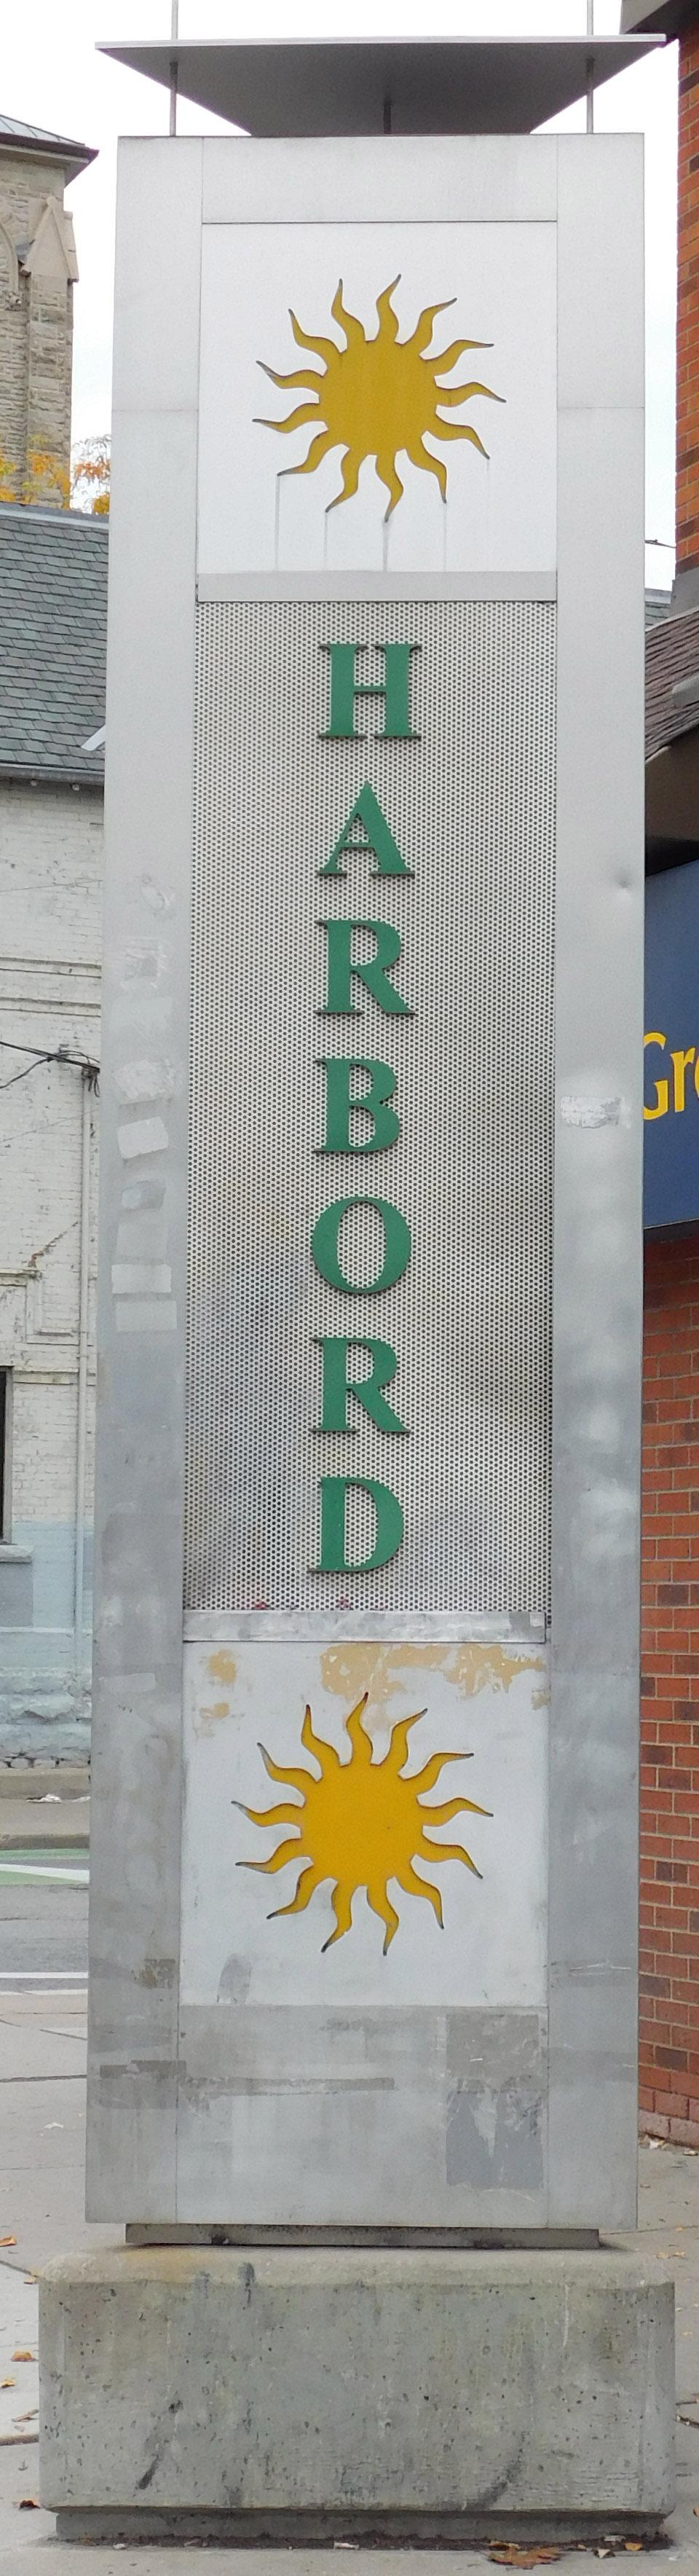 Harbord Street BIA